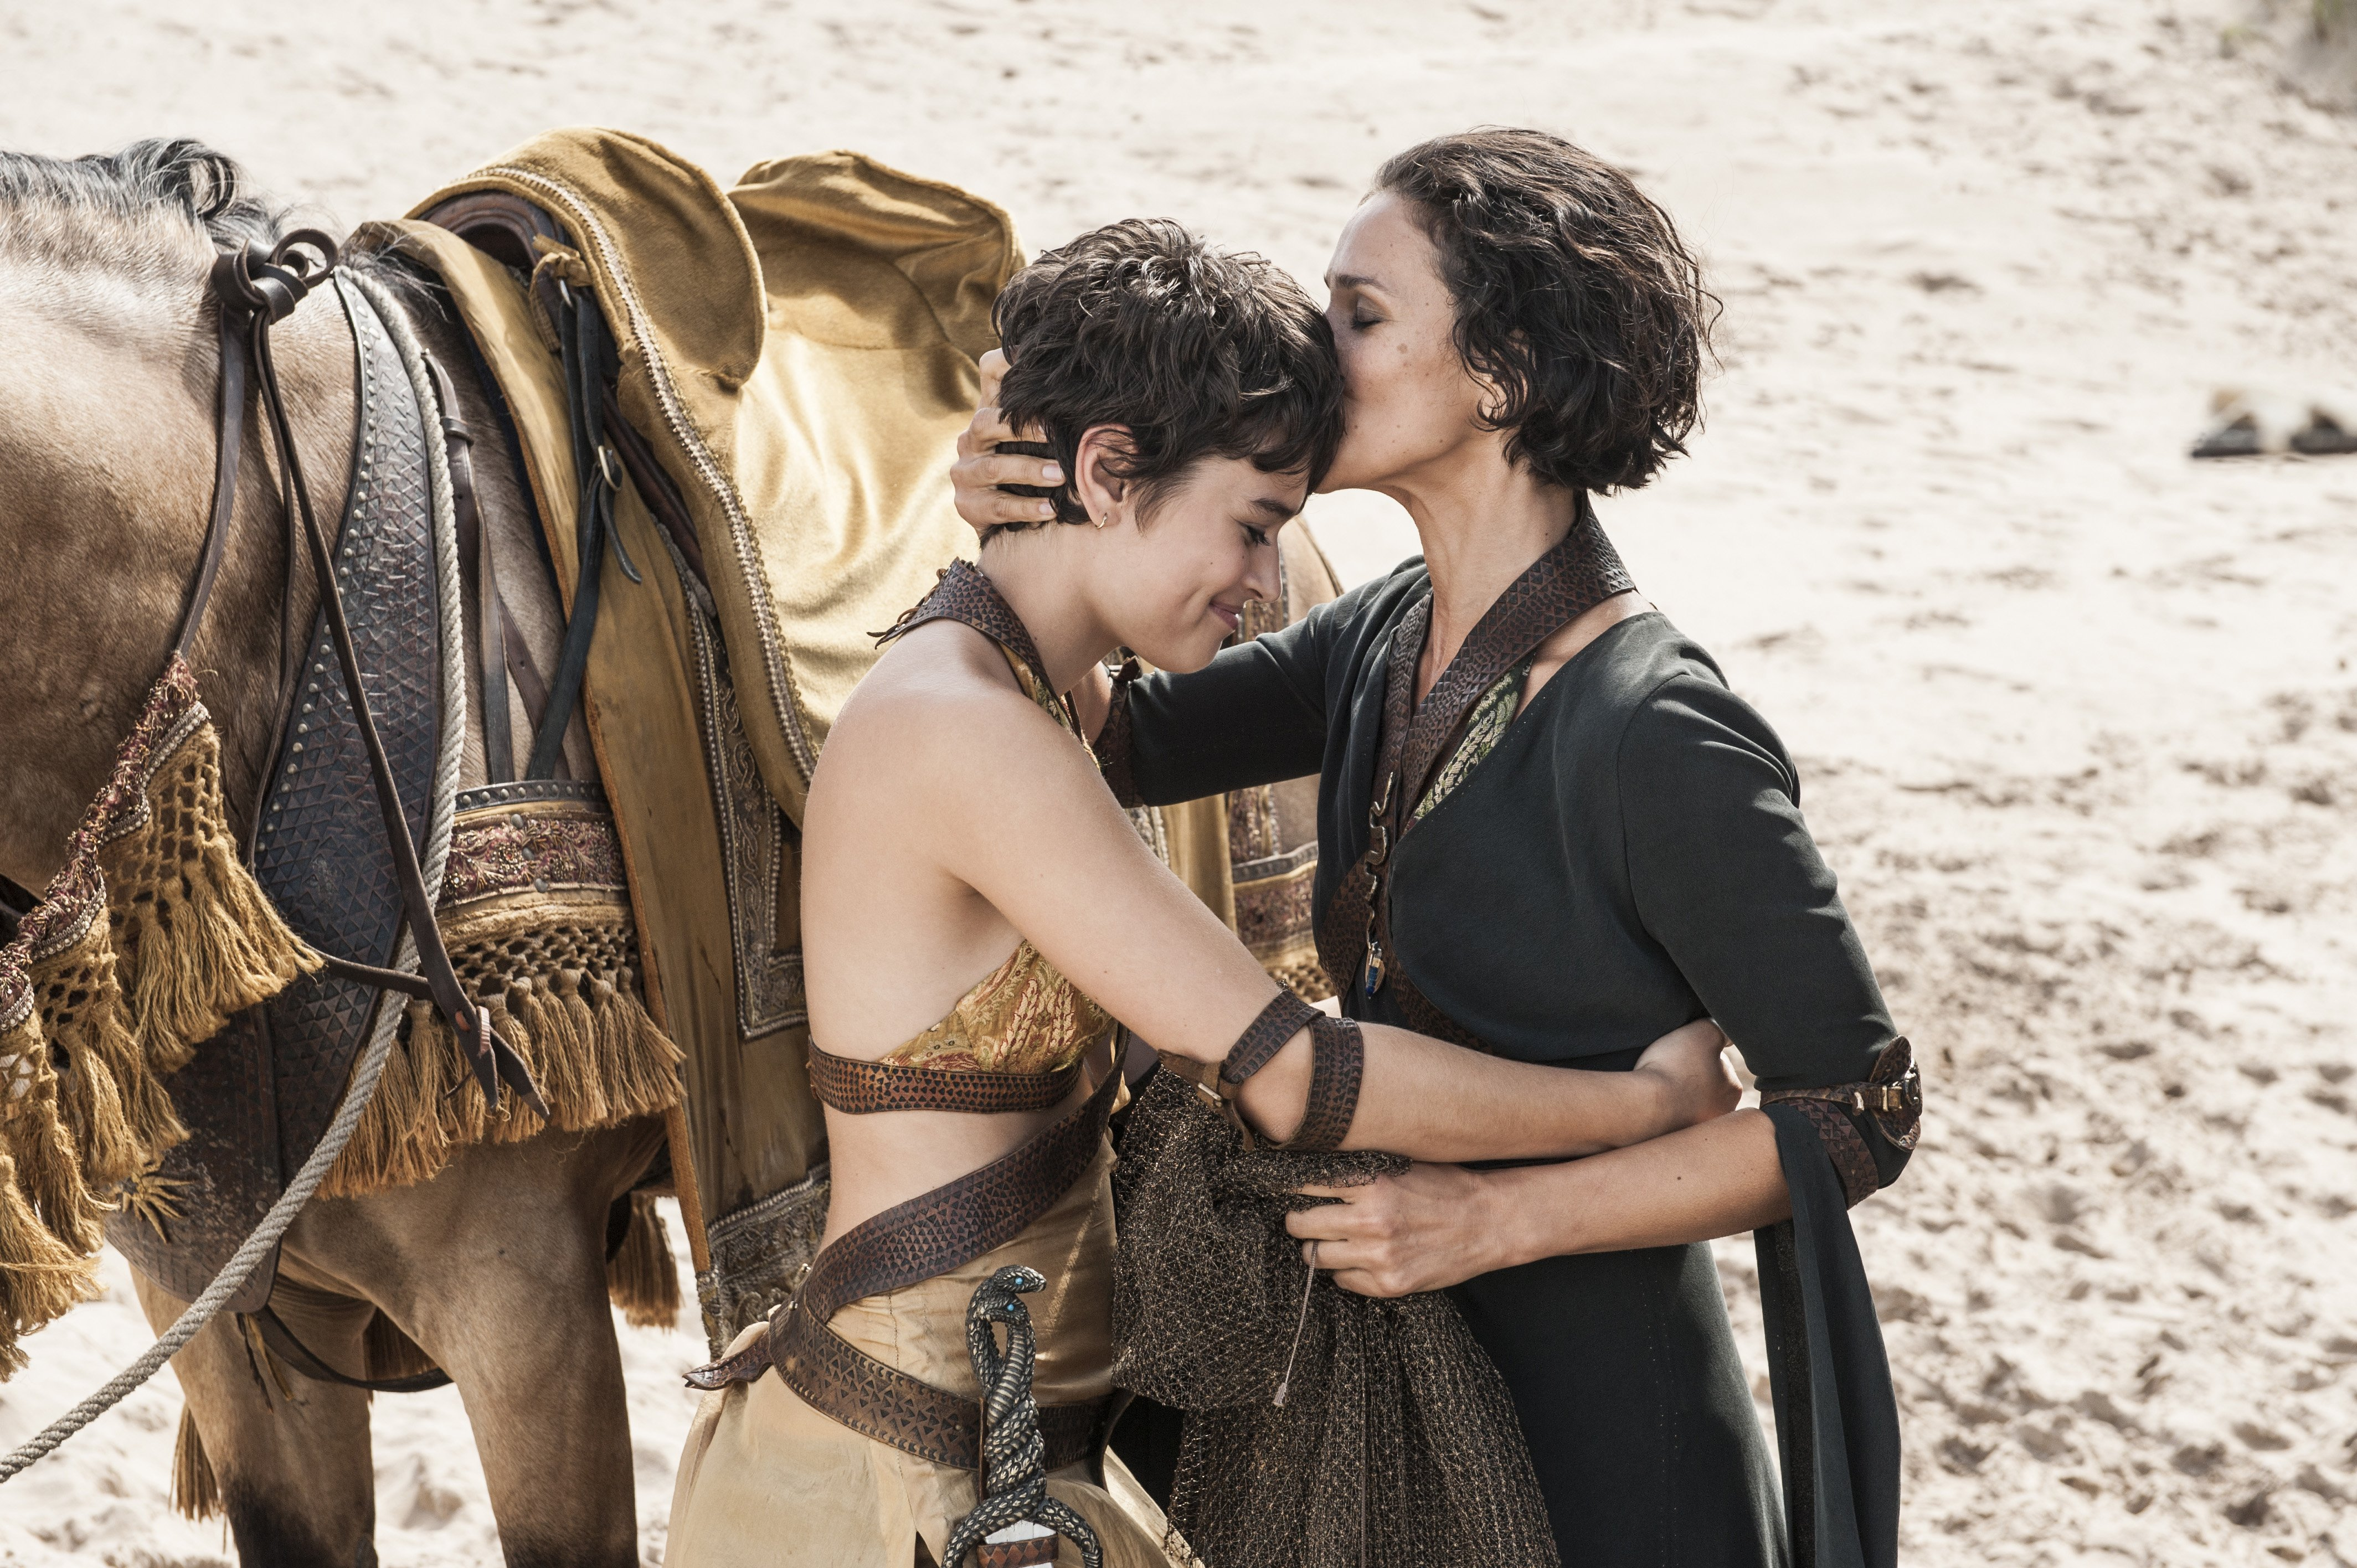 Rosabell Laurenti Sellers Tyene Sand Game of Thrones Season 5